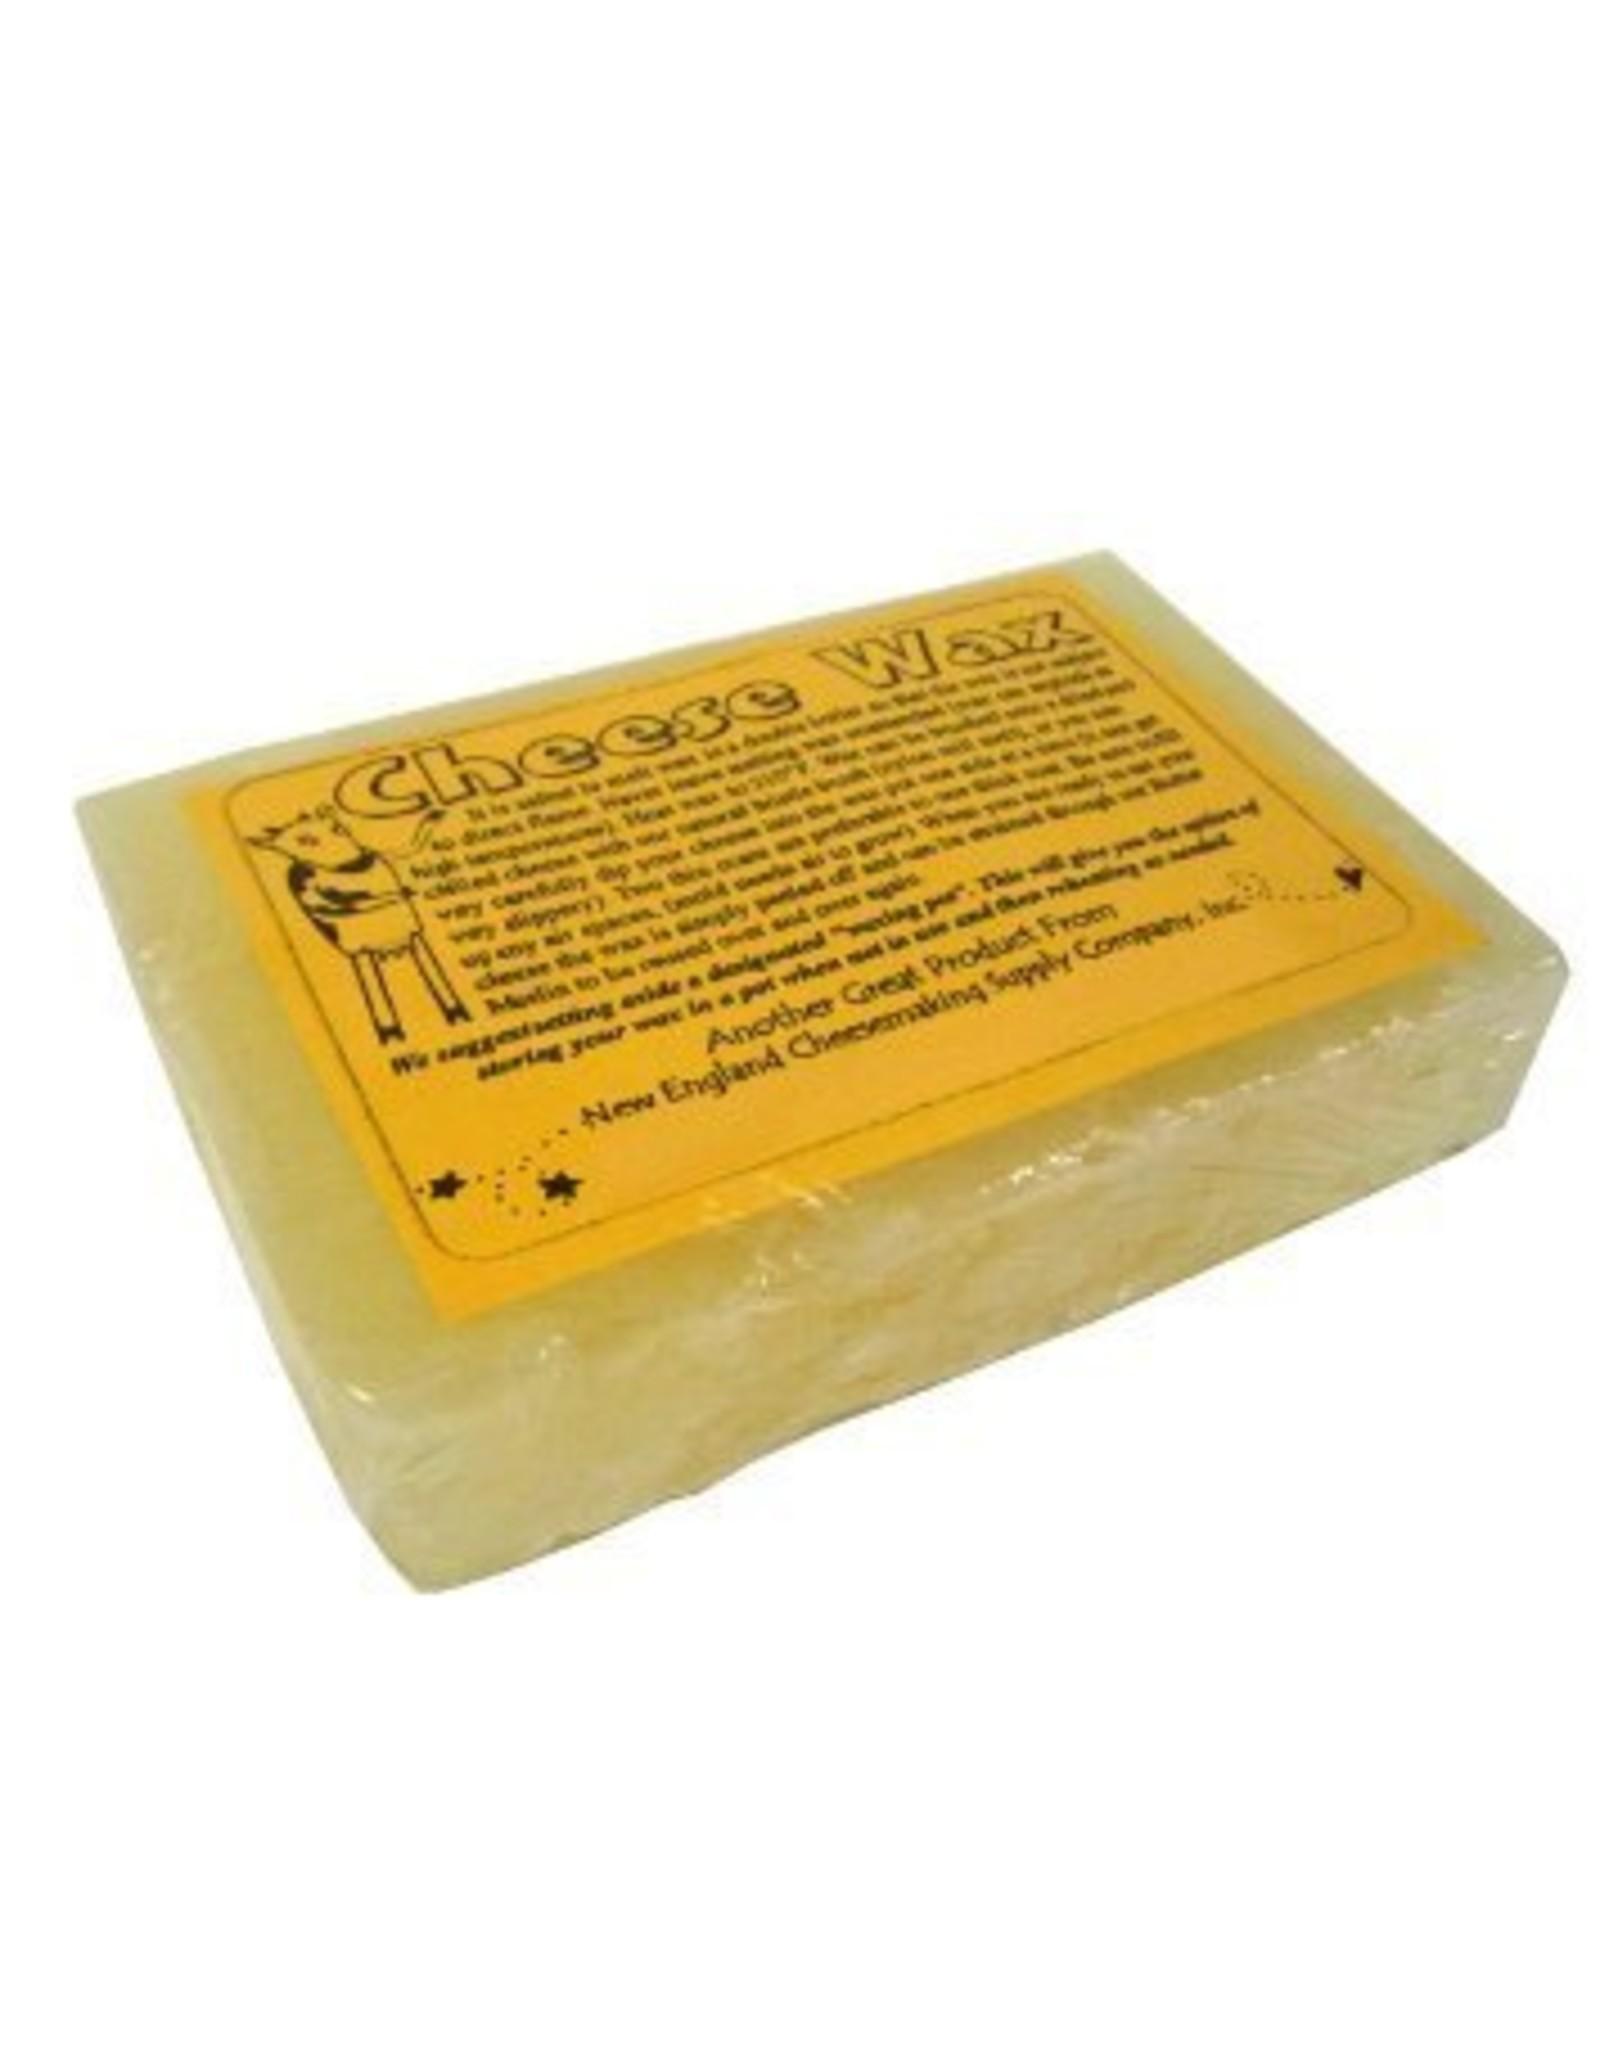 Ricki 1lb Yellow Cheese Wax